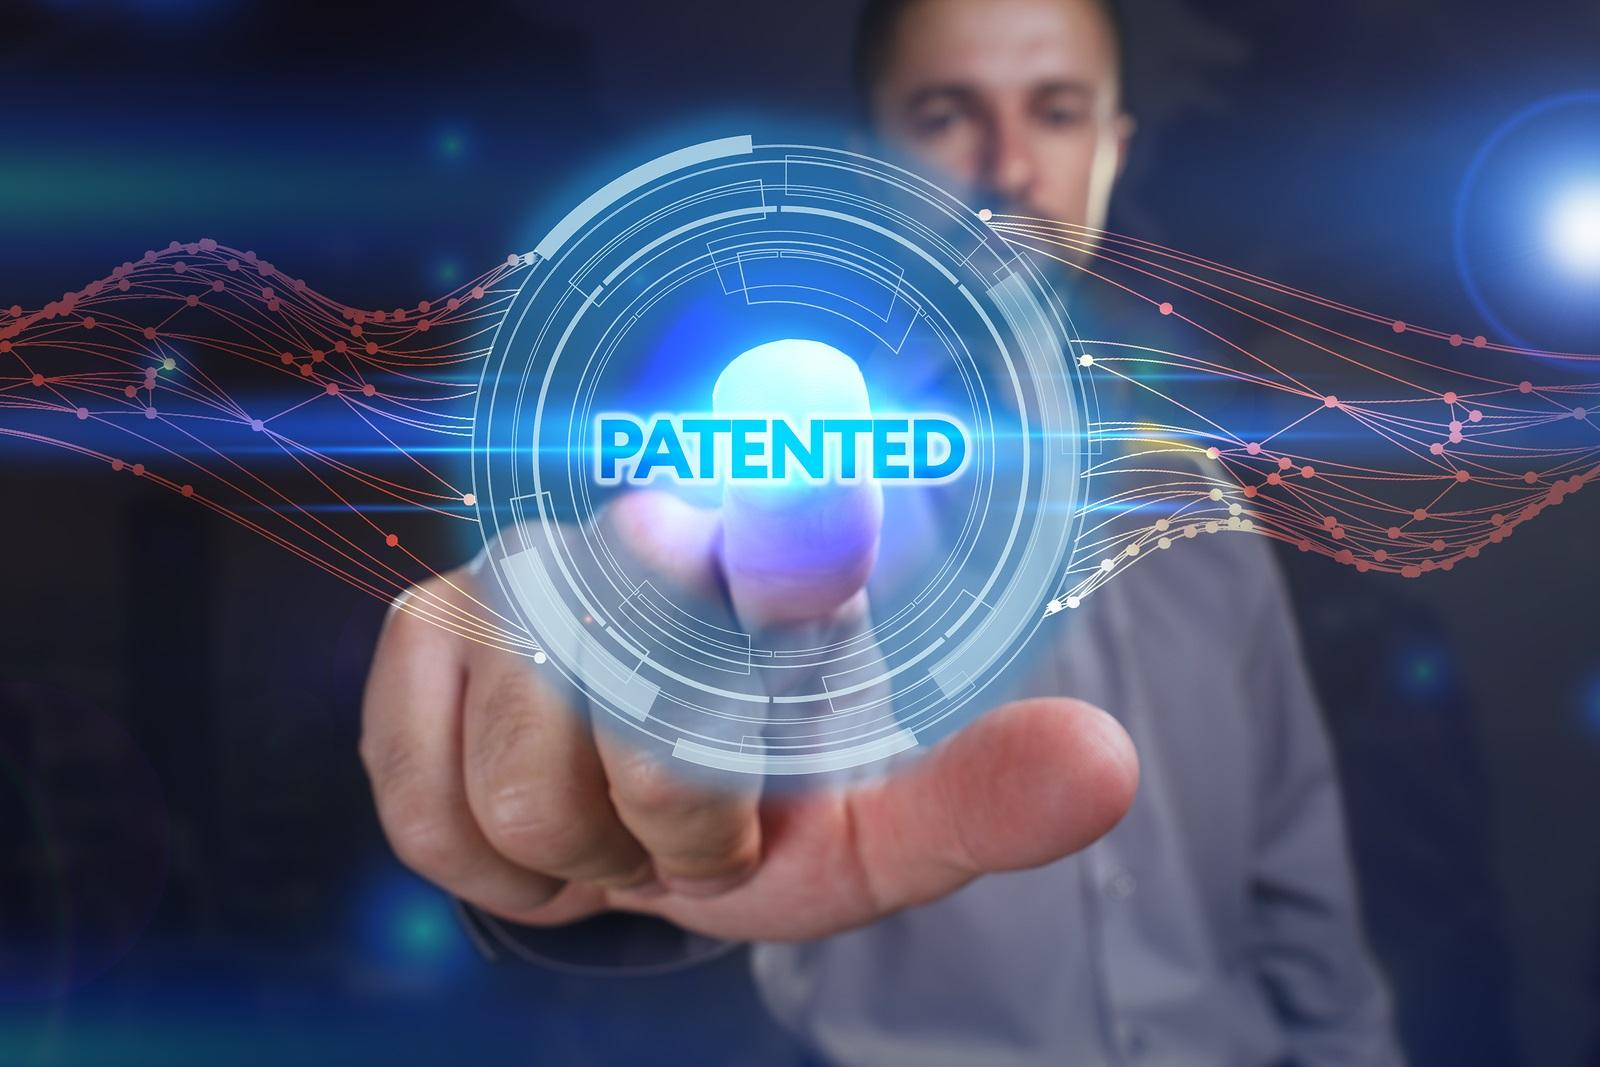 Legal Advantage, LLC - Patent Illustrations & Patent Search image 4